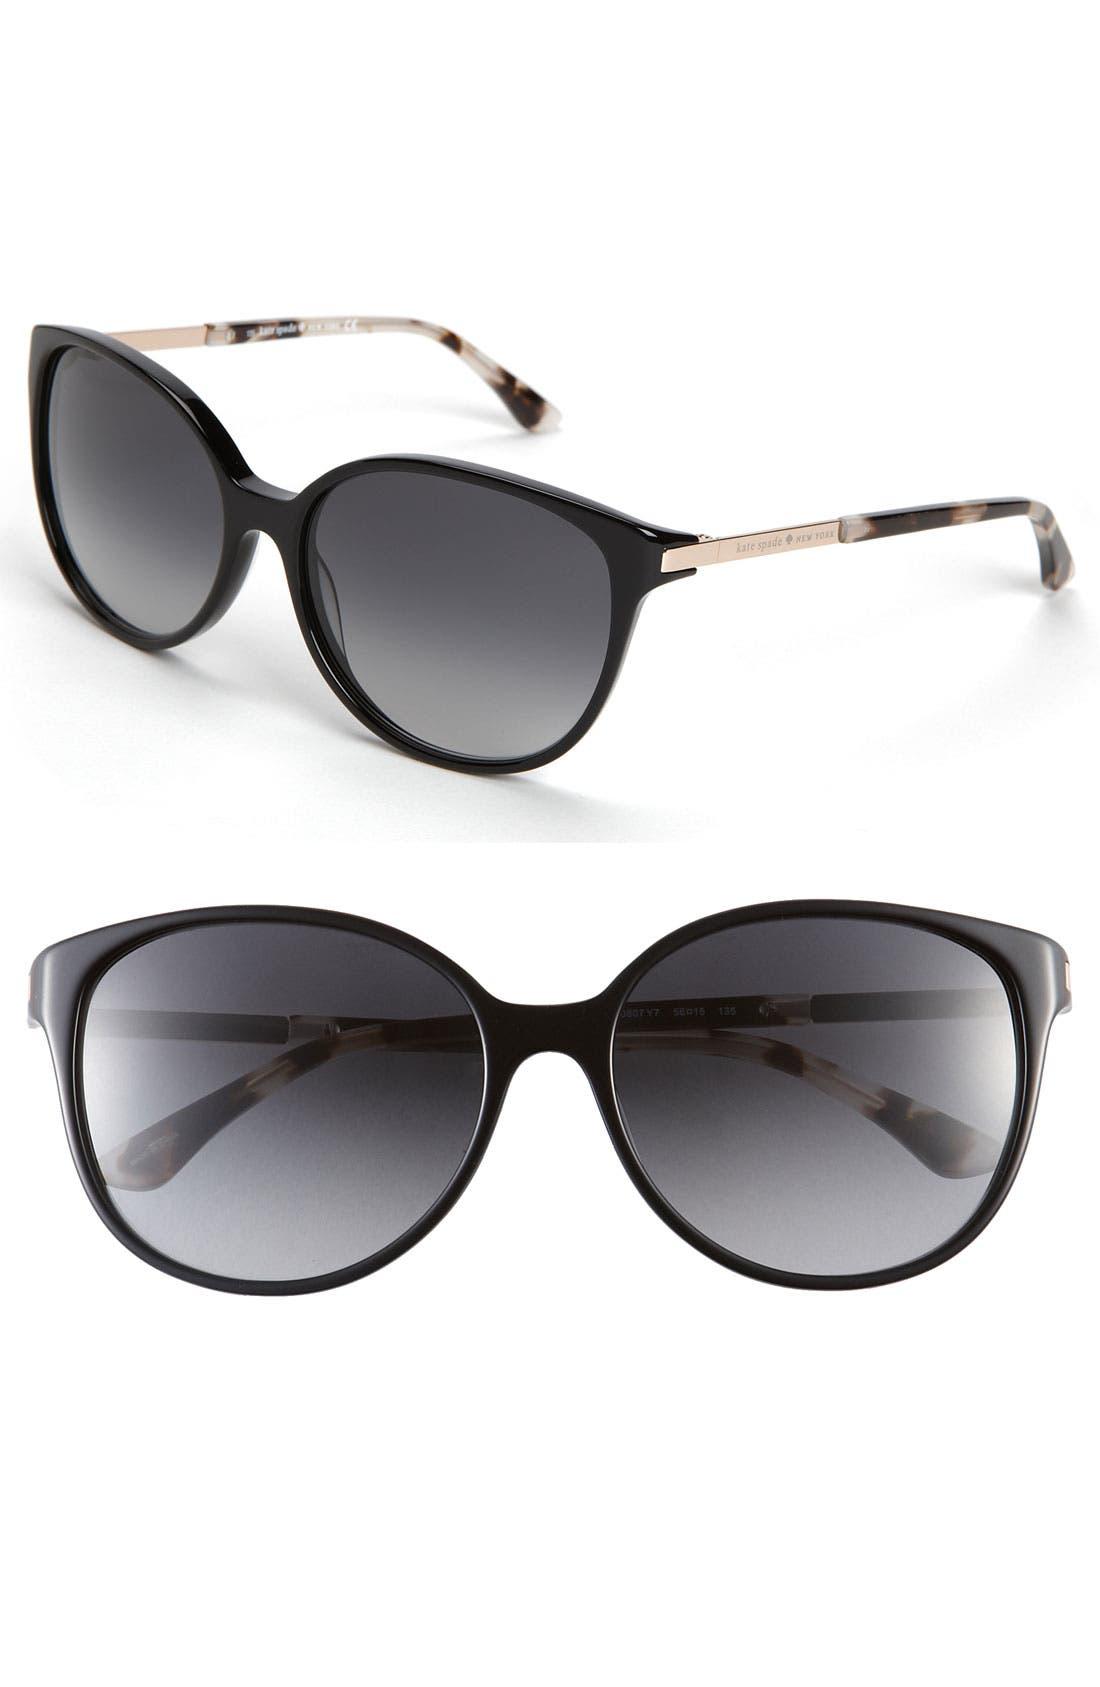 KATE SPADE NEW YORK, 'shawna' 56mm sunglasses, Main thumbnail 1, color, 001